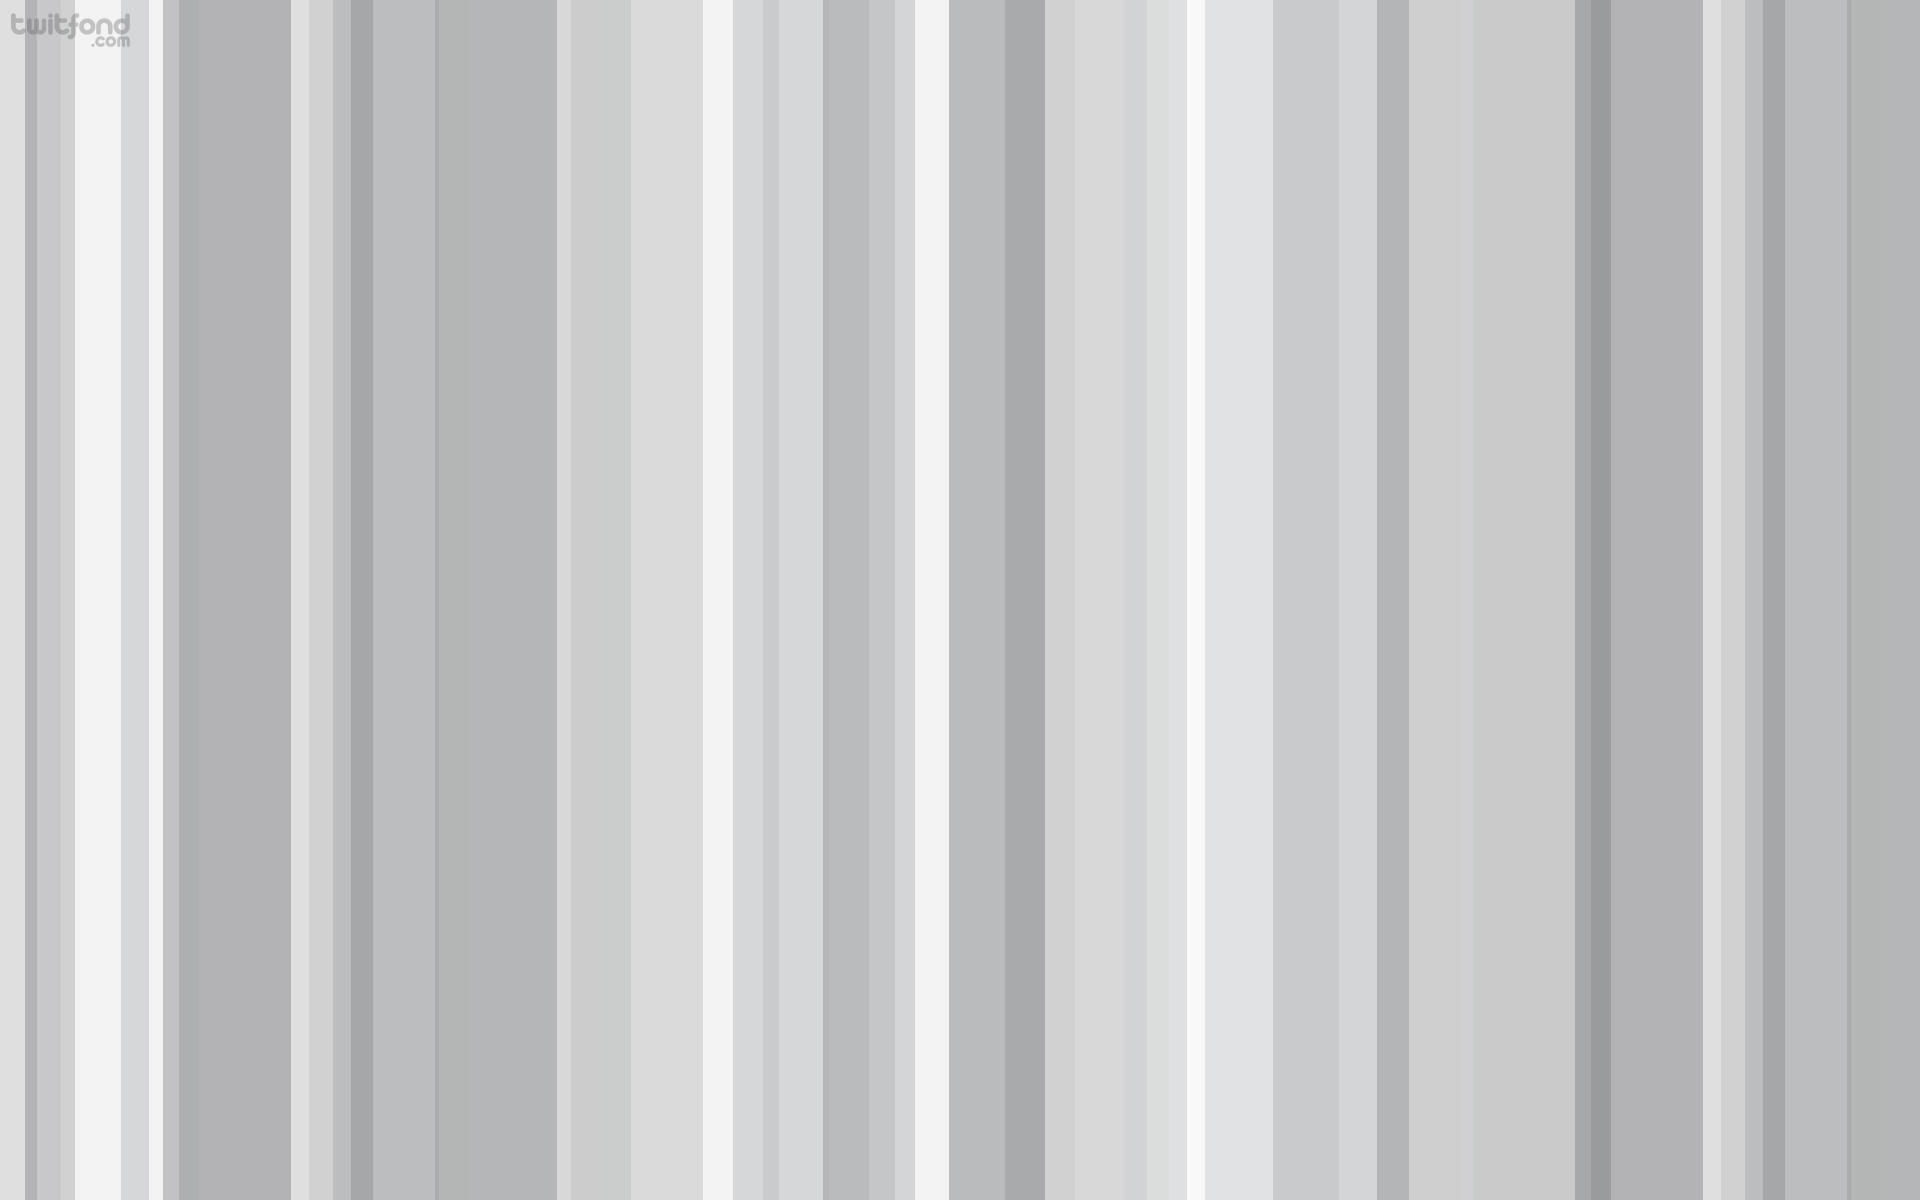 8cc1920a290690a2dffe107802d04adf_large.jpg